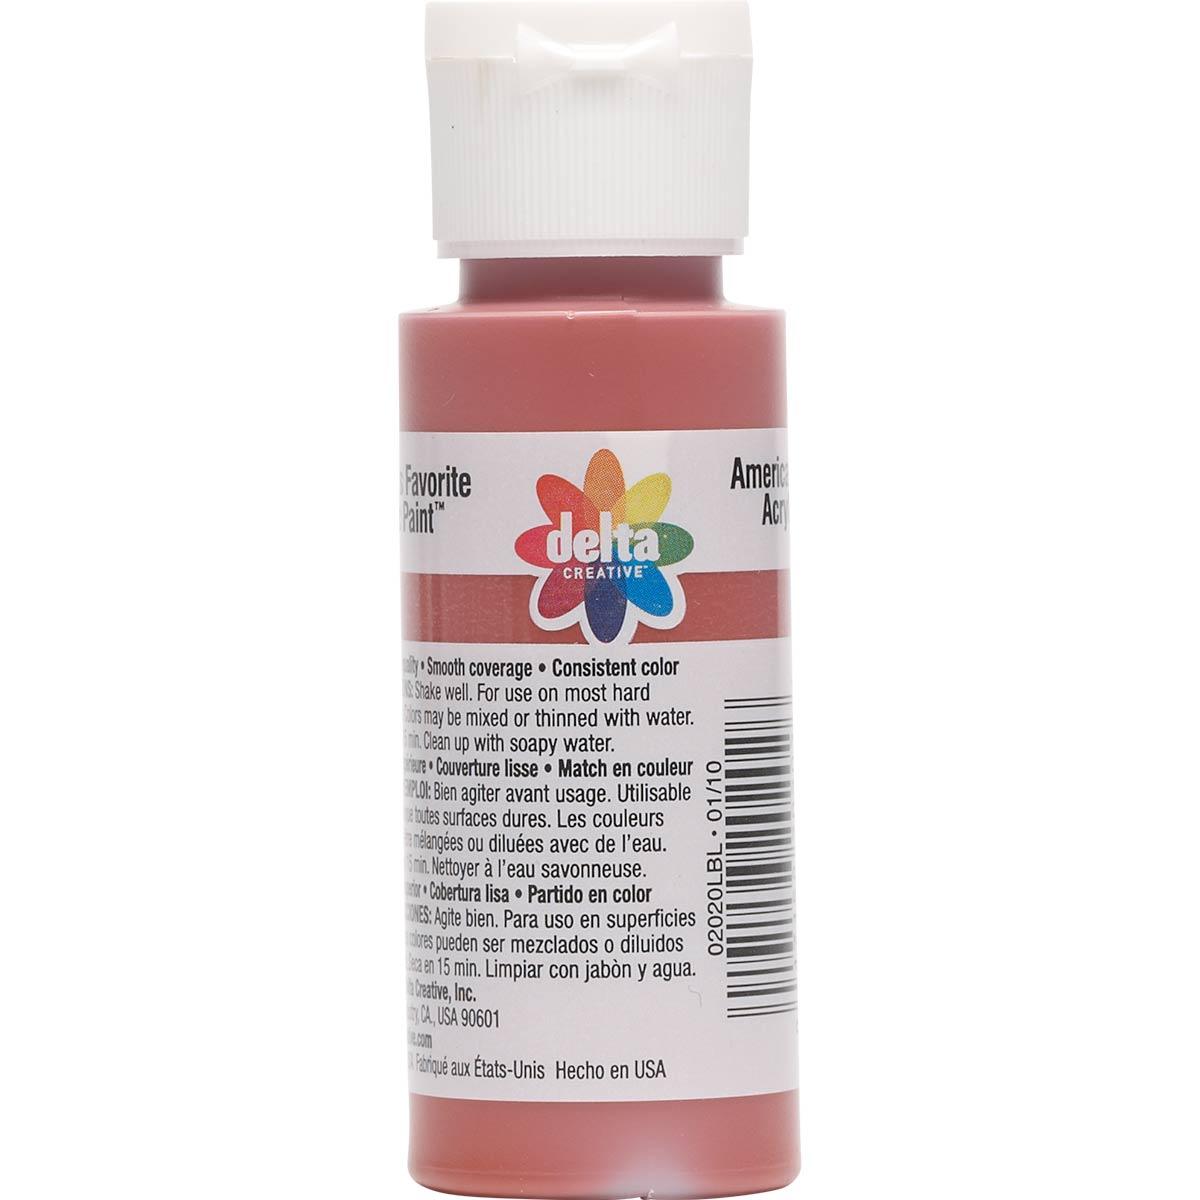 Delta Ceramcoat ® Acrylic Paint - Red Iron Oxide, 2 oz.